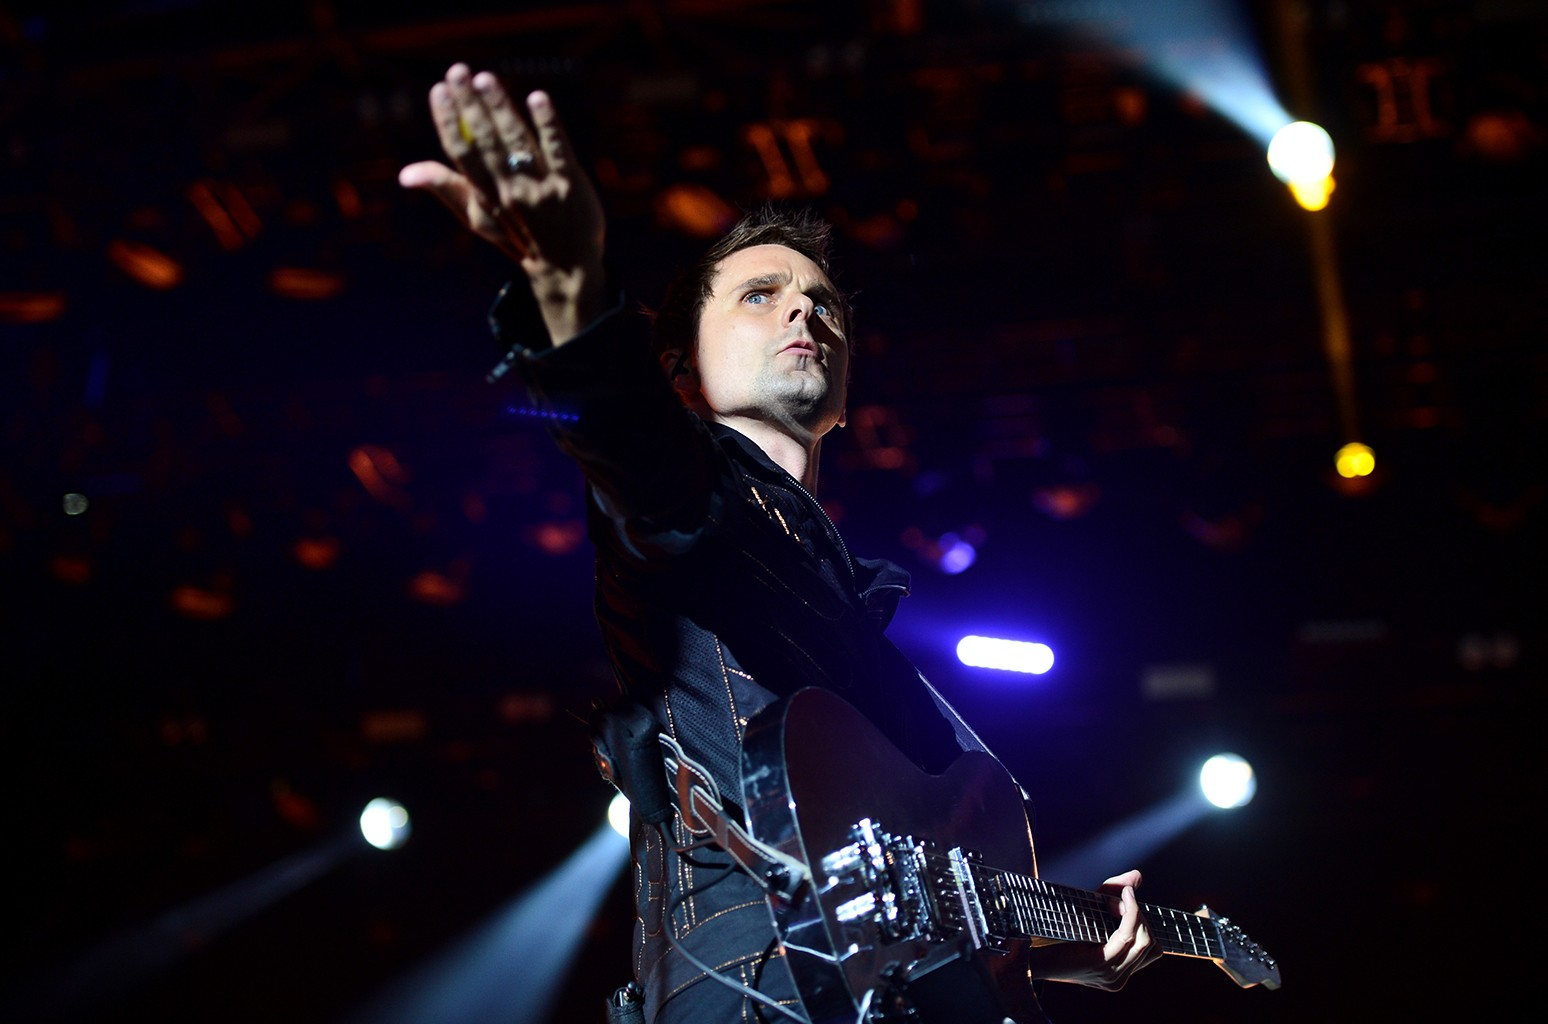 Muse perform at Glastonbury Festival